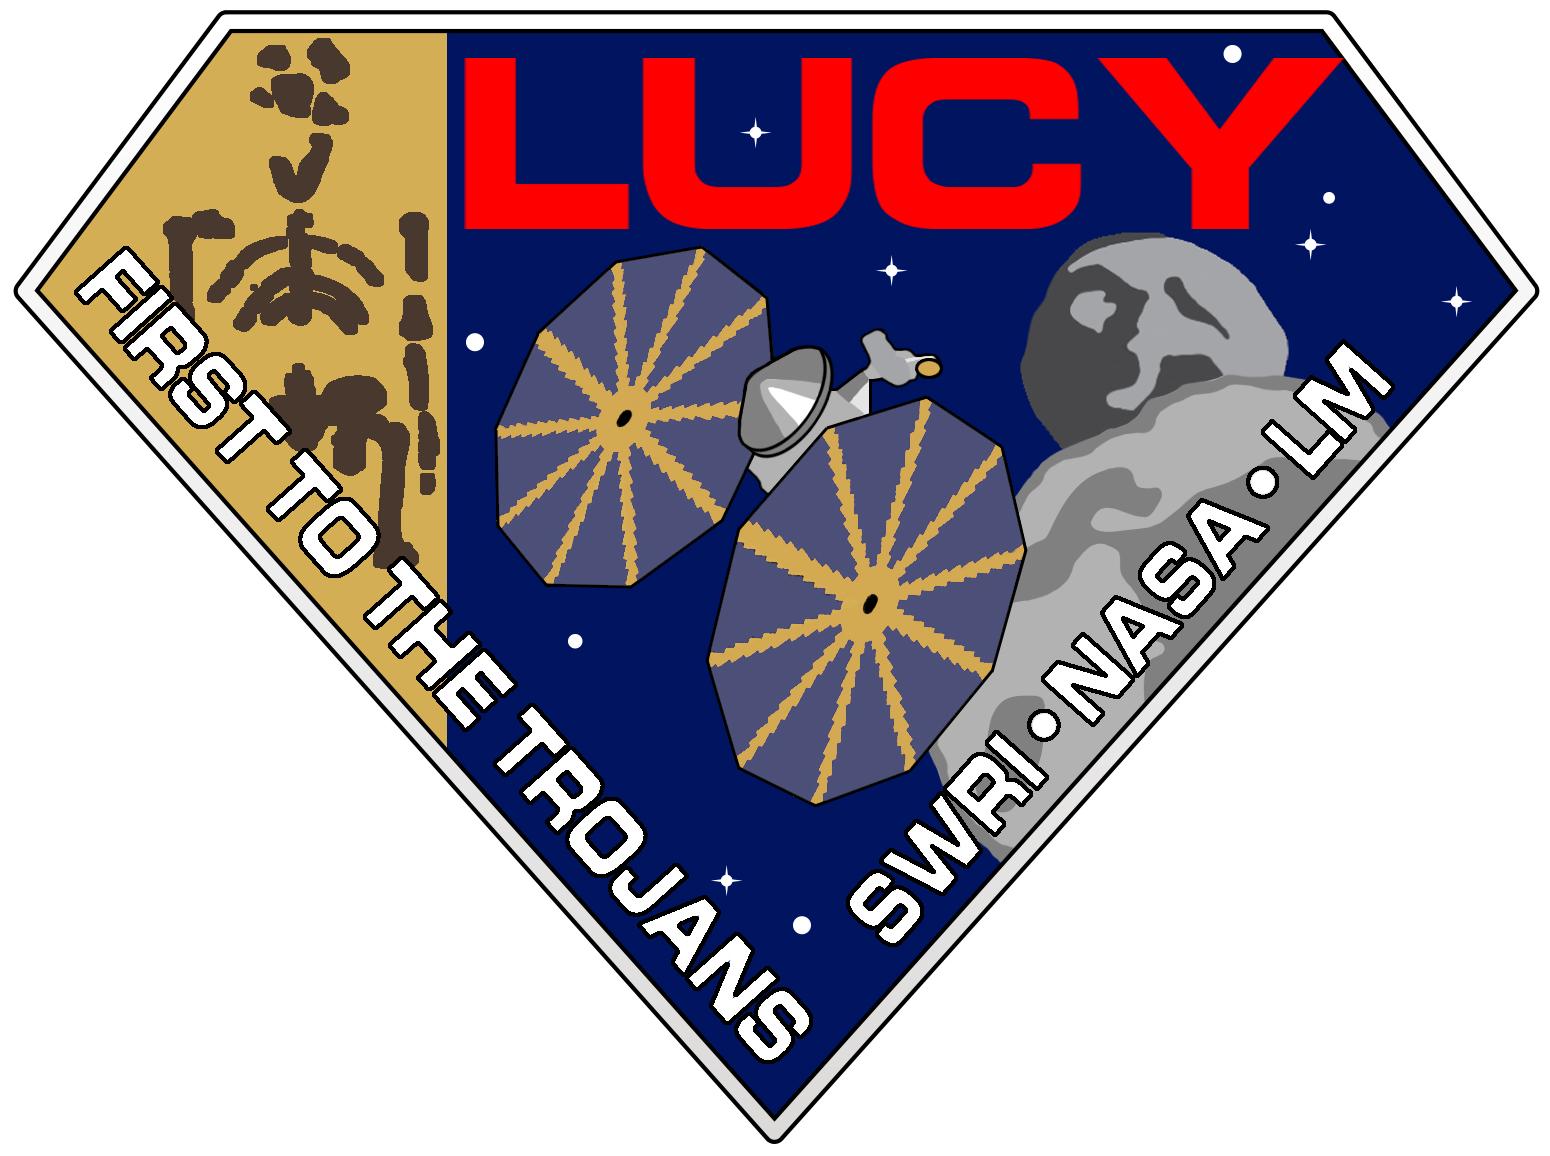 https://www.nasa.gov/sites/default/files/thumbnails/image/lucy_final_logosv.png